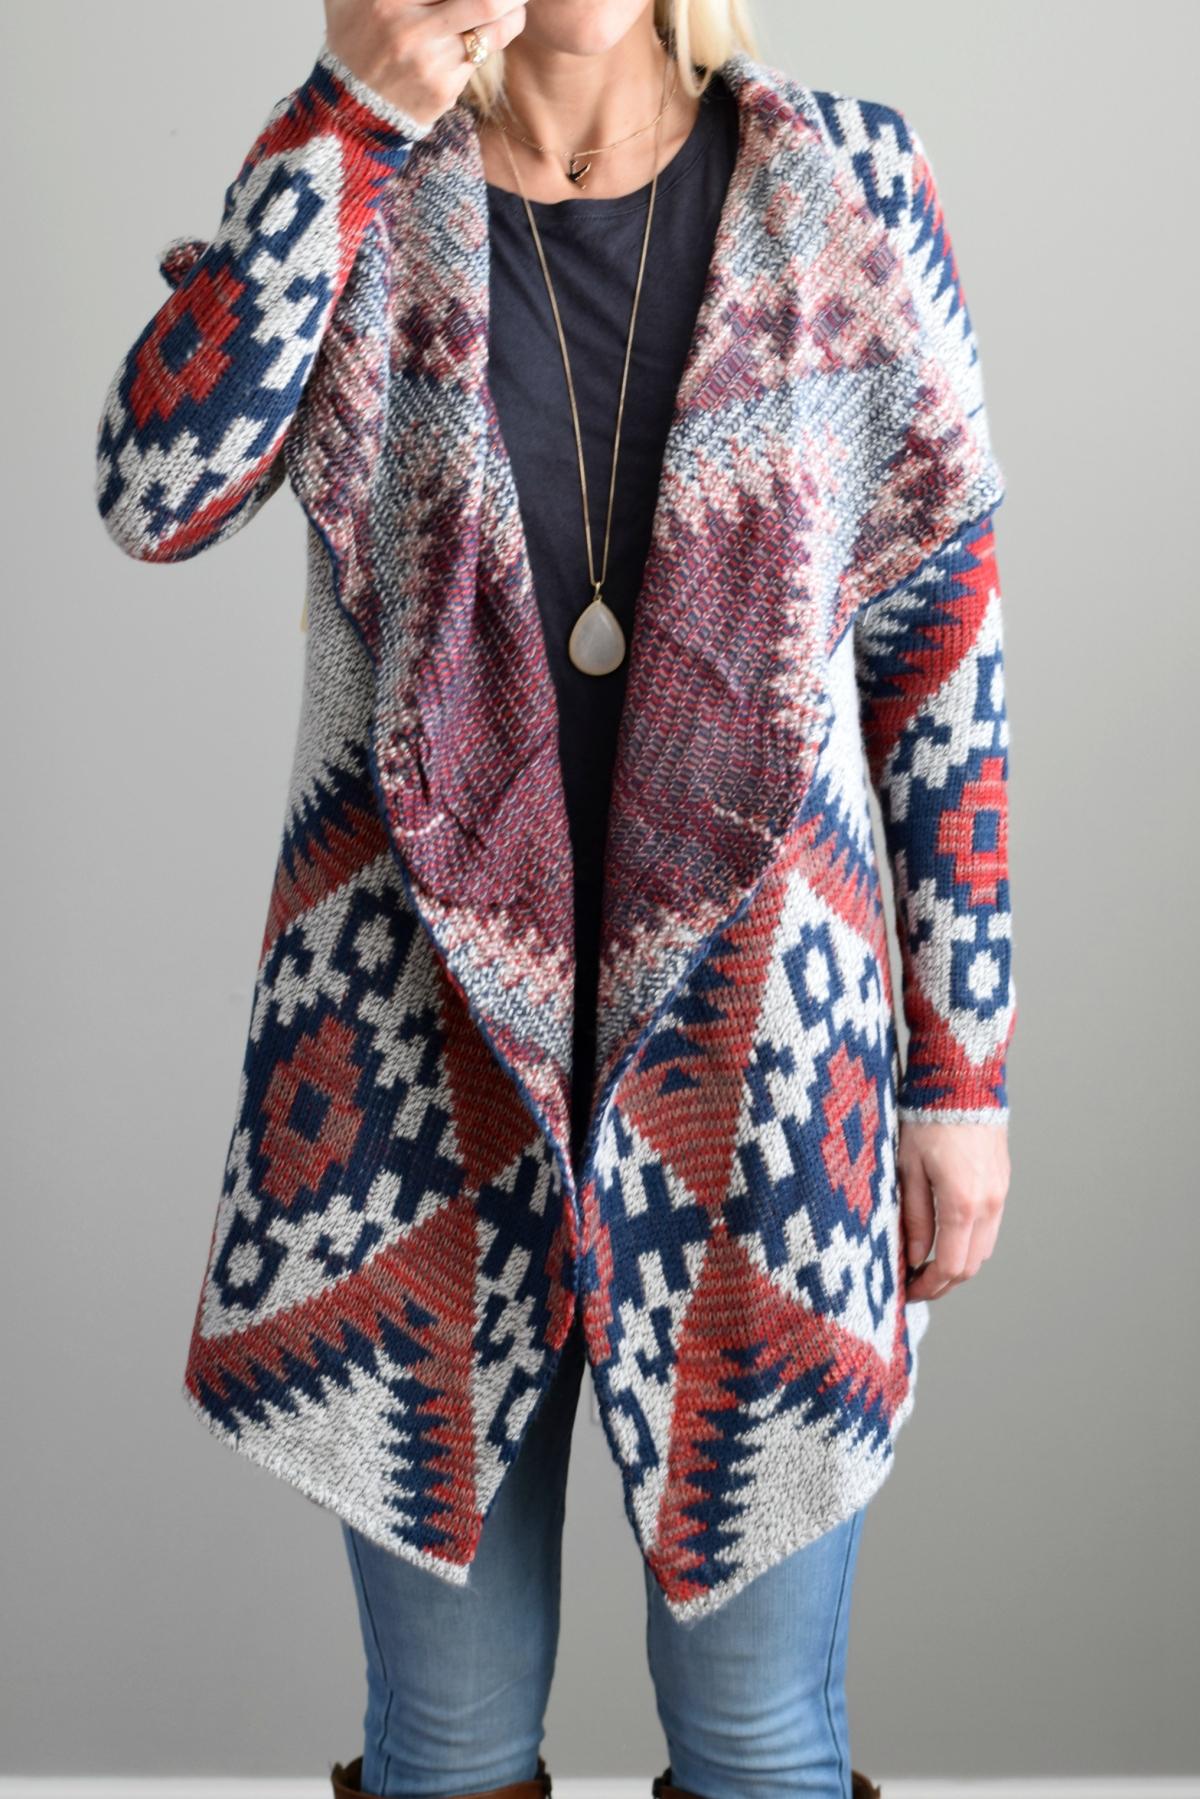 January 2016 Stitch Fix Review: RD Style Tawny Open Drape Cardigan |www.pearlsandsportsbras.com|